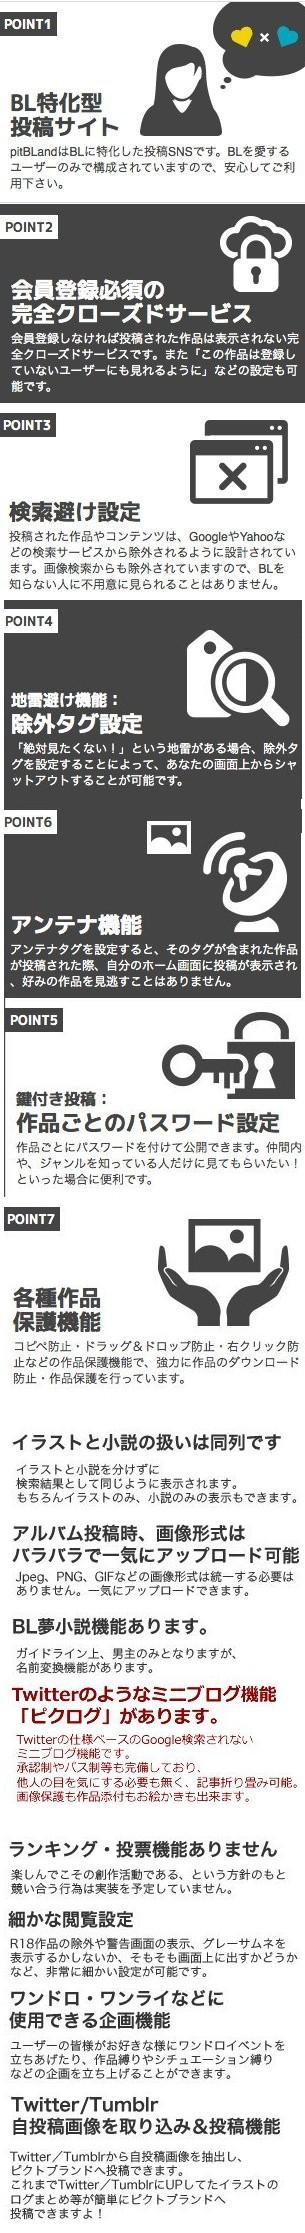 https://cdn-ak.f.st-hatena.com/images/fotolife/k/kensetu/20180509/20180509232116_original.jpg